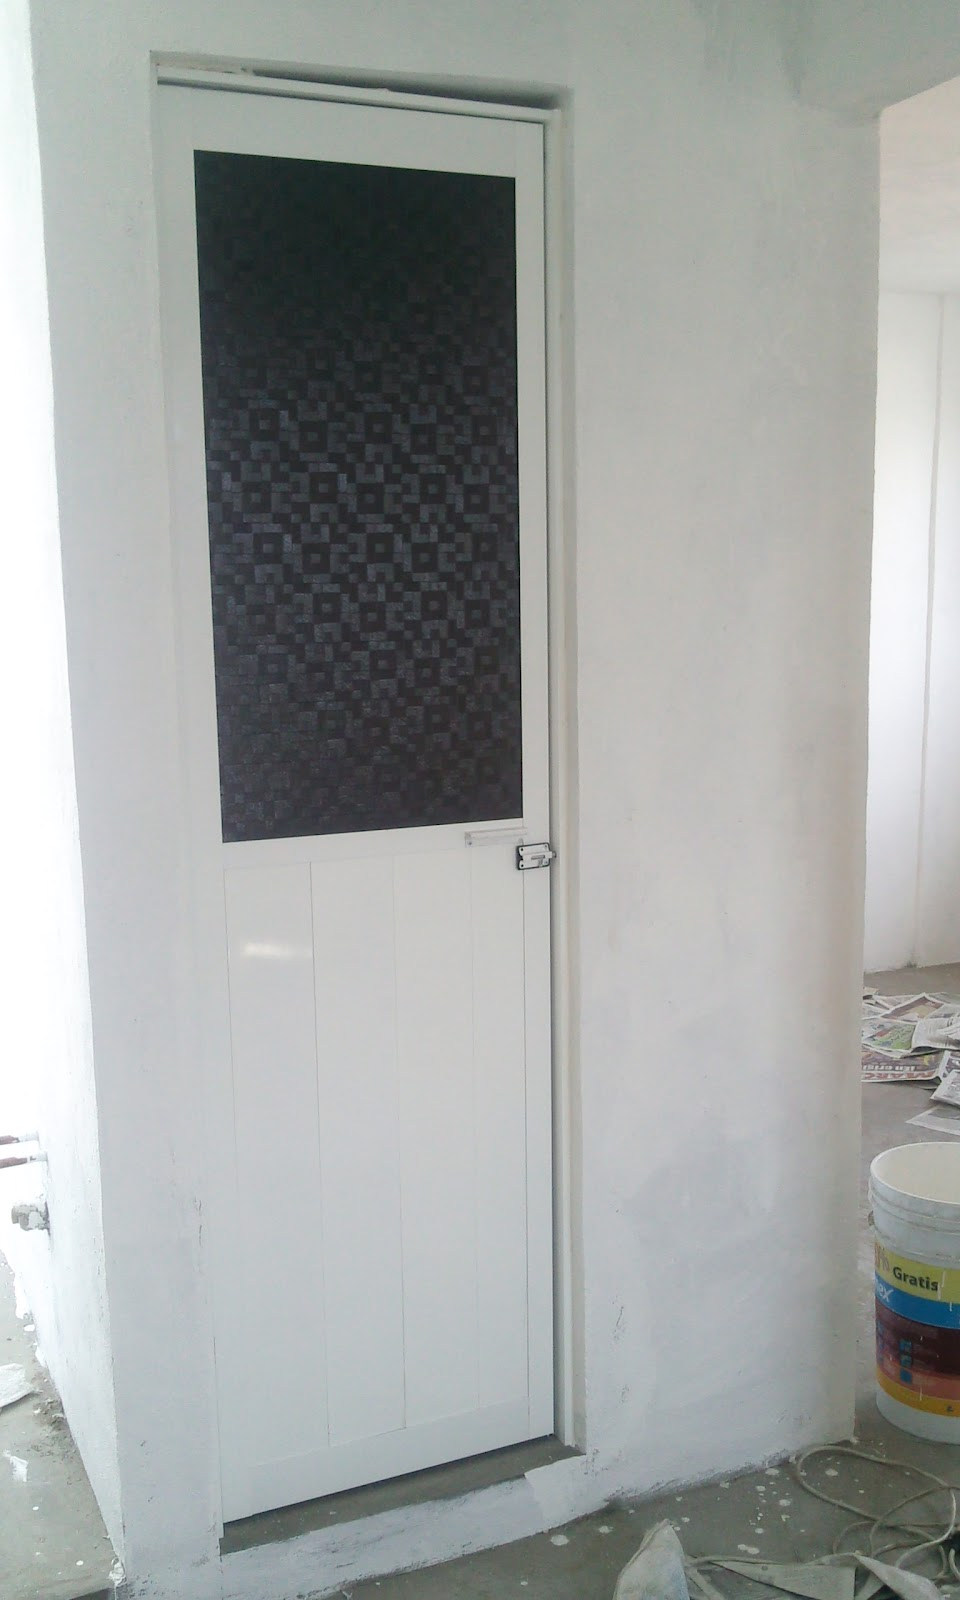 Perfil de aluminio para puertas de ba o - Puerta balconera aluminio ...